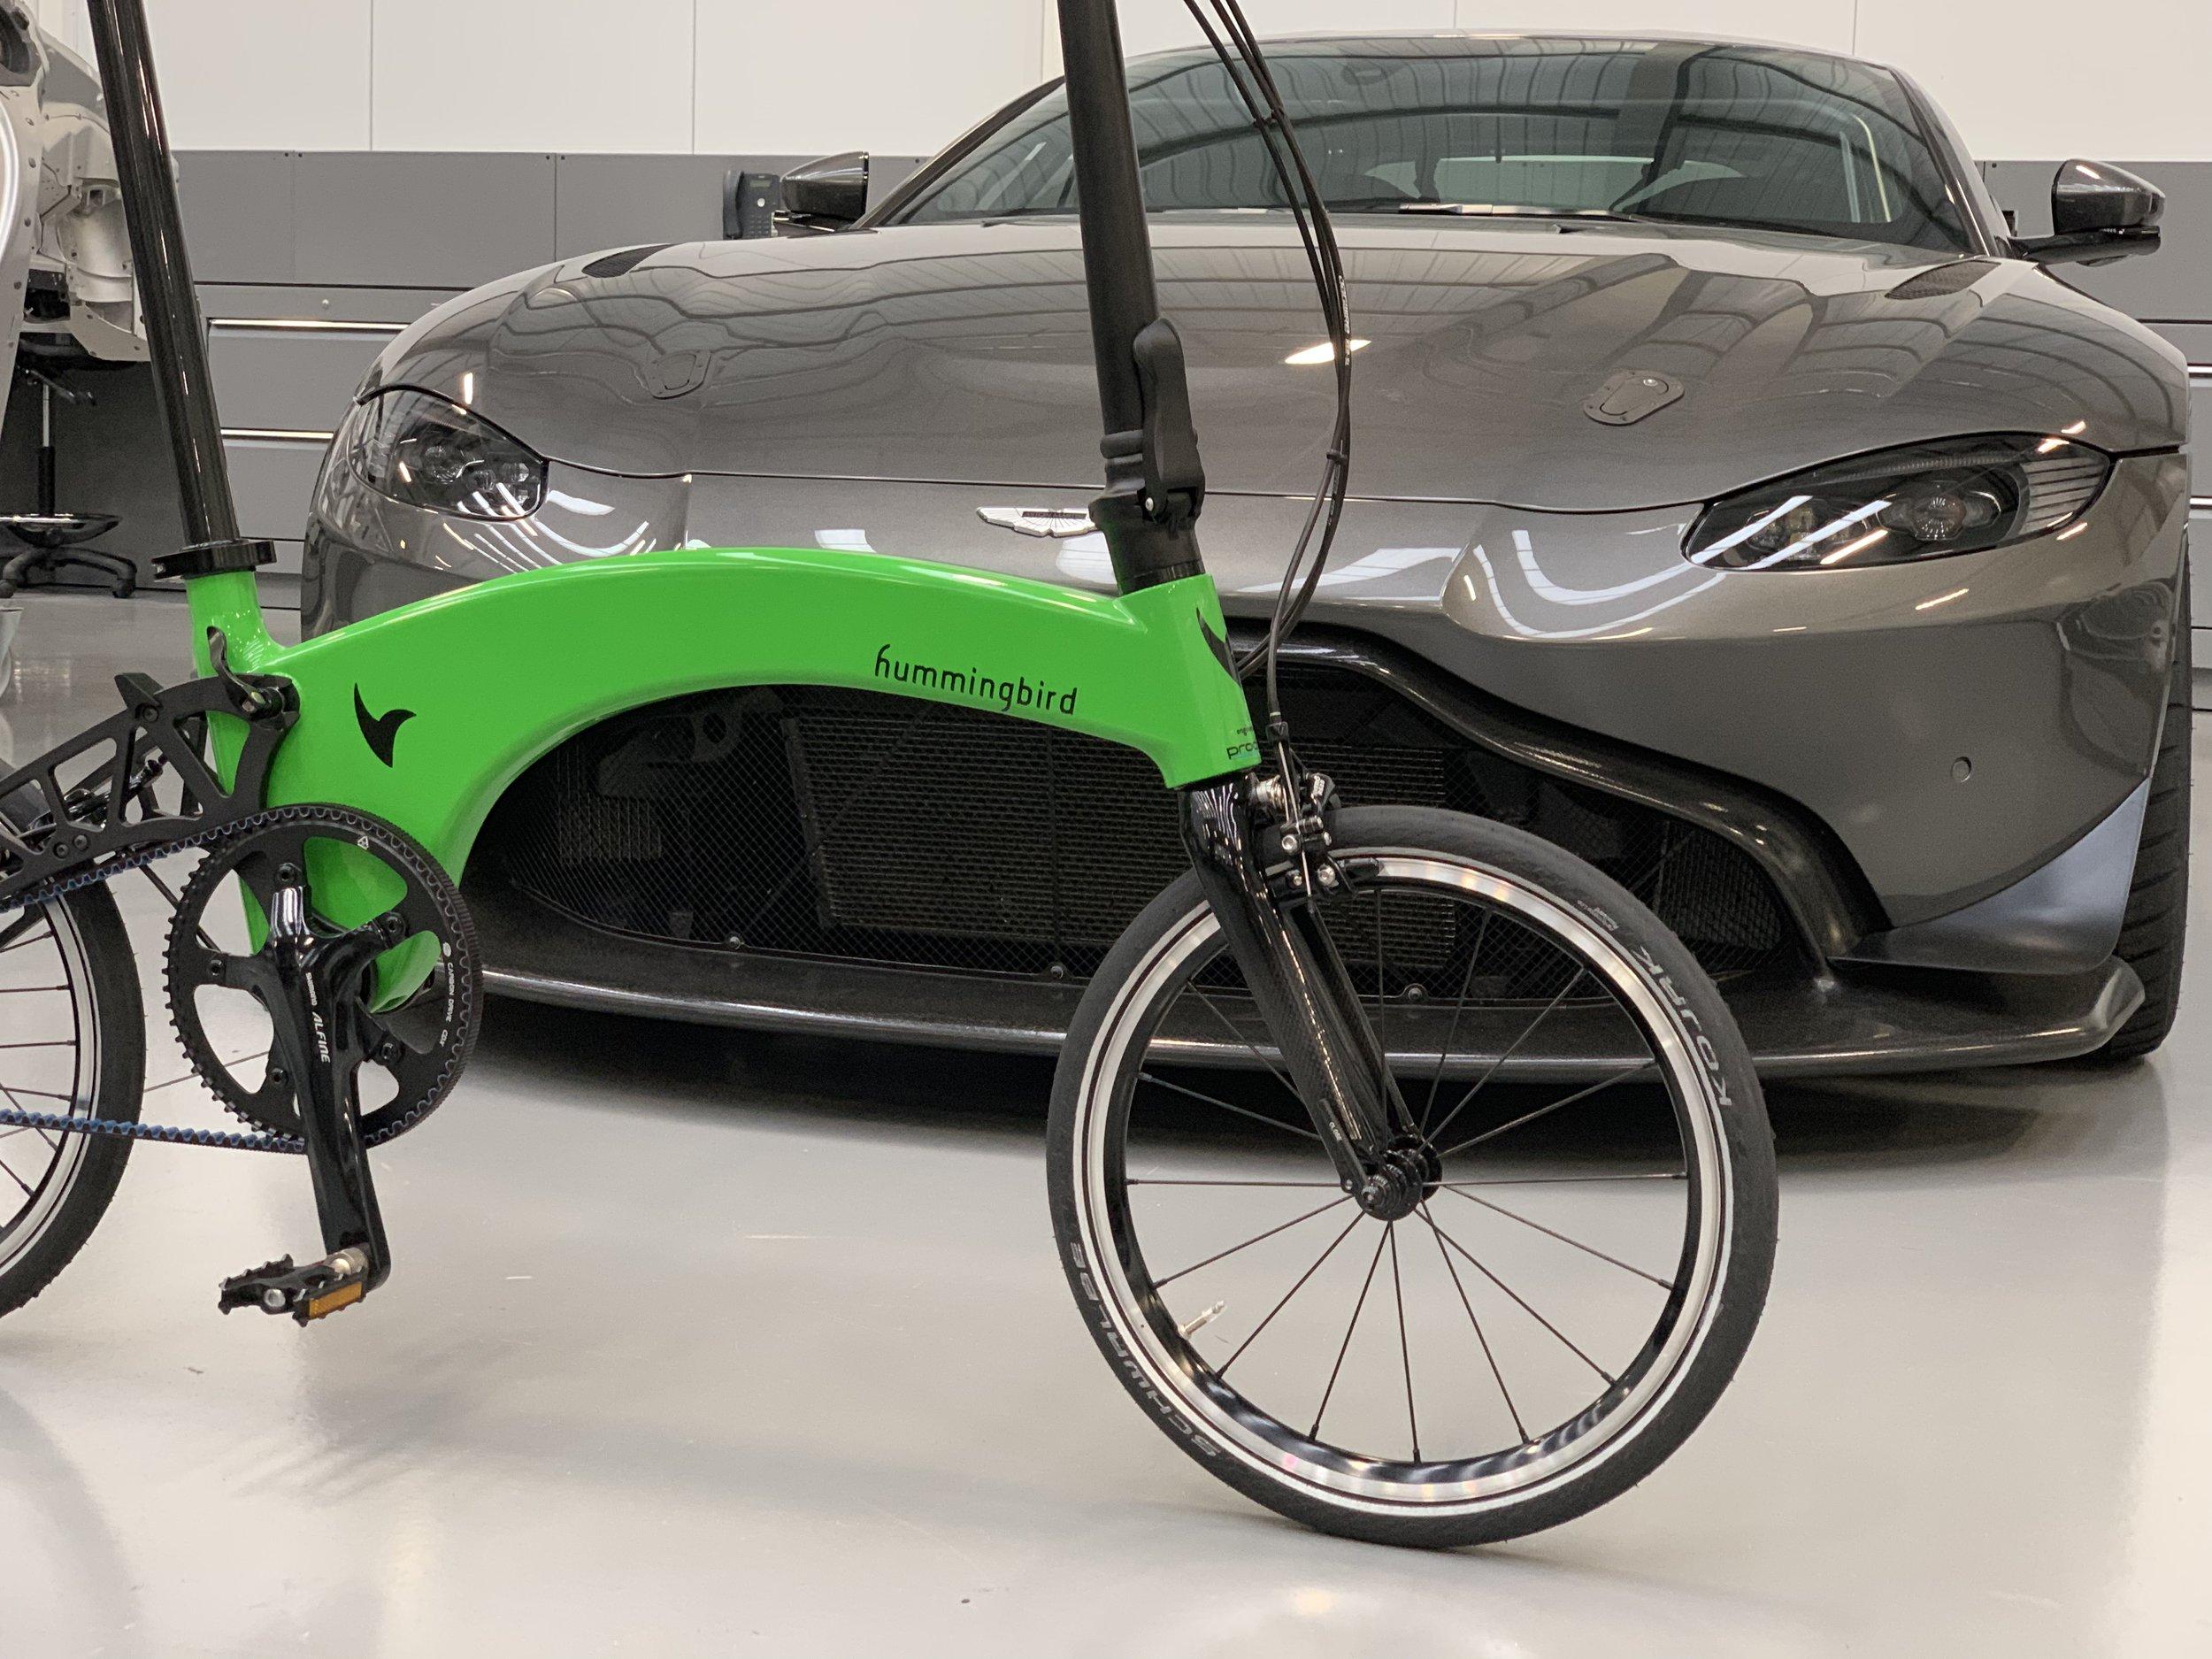 Hummingbird Belt drive In Kermit Green to match Aston Martin Vantage 2019